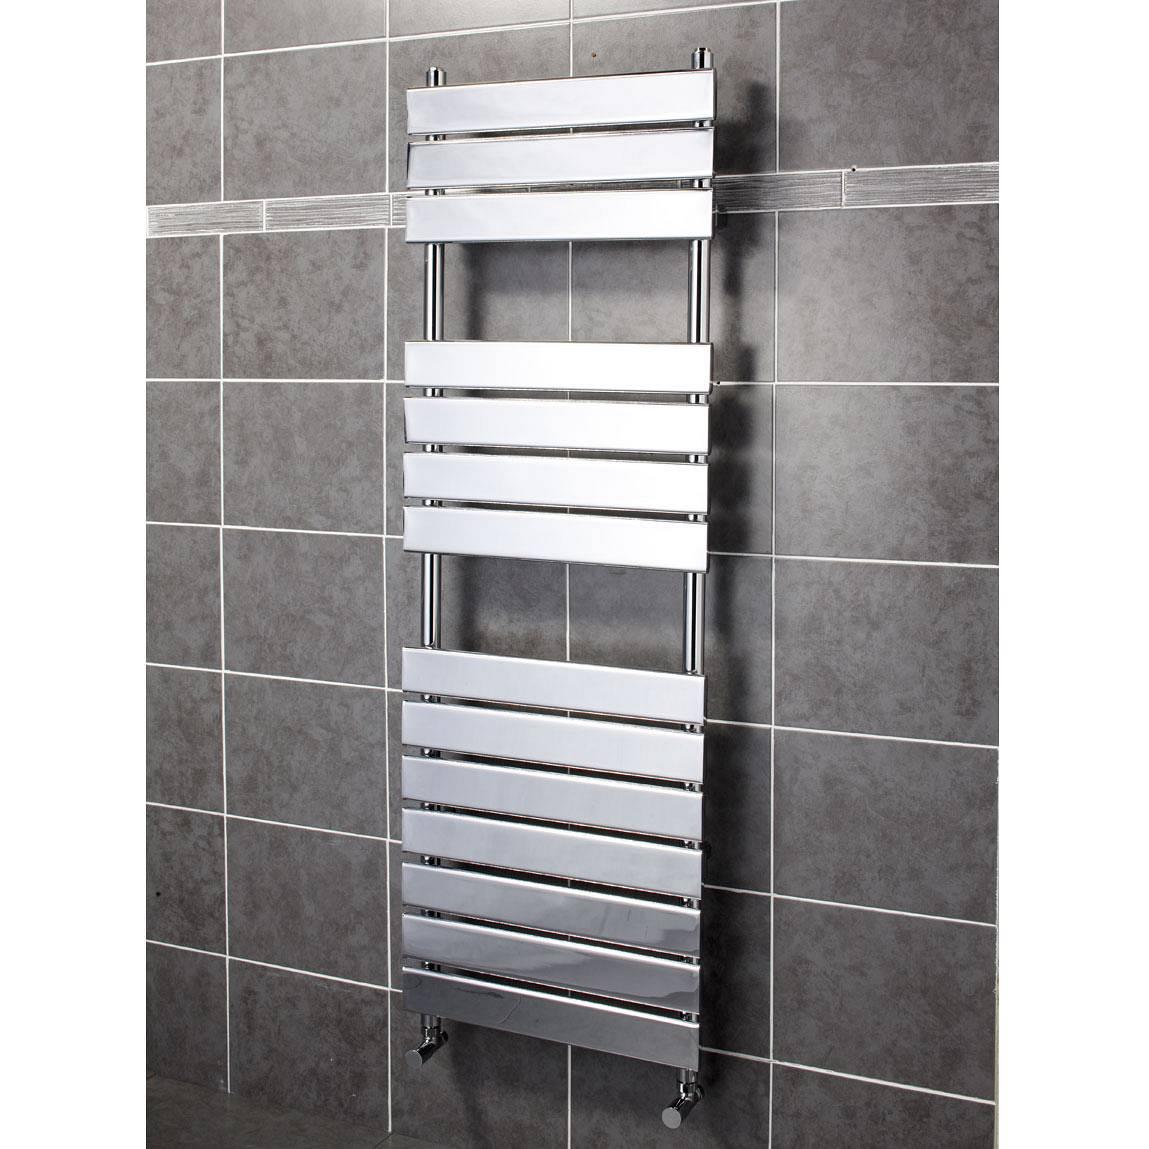 Heated Towel Rails Radiators Baxx Heated Towel Rail: Install Heated Towel Rail, Radiator/per Item